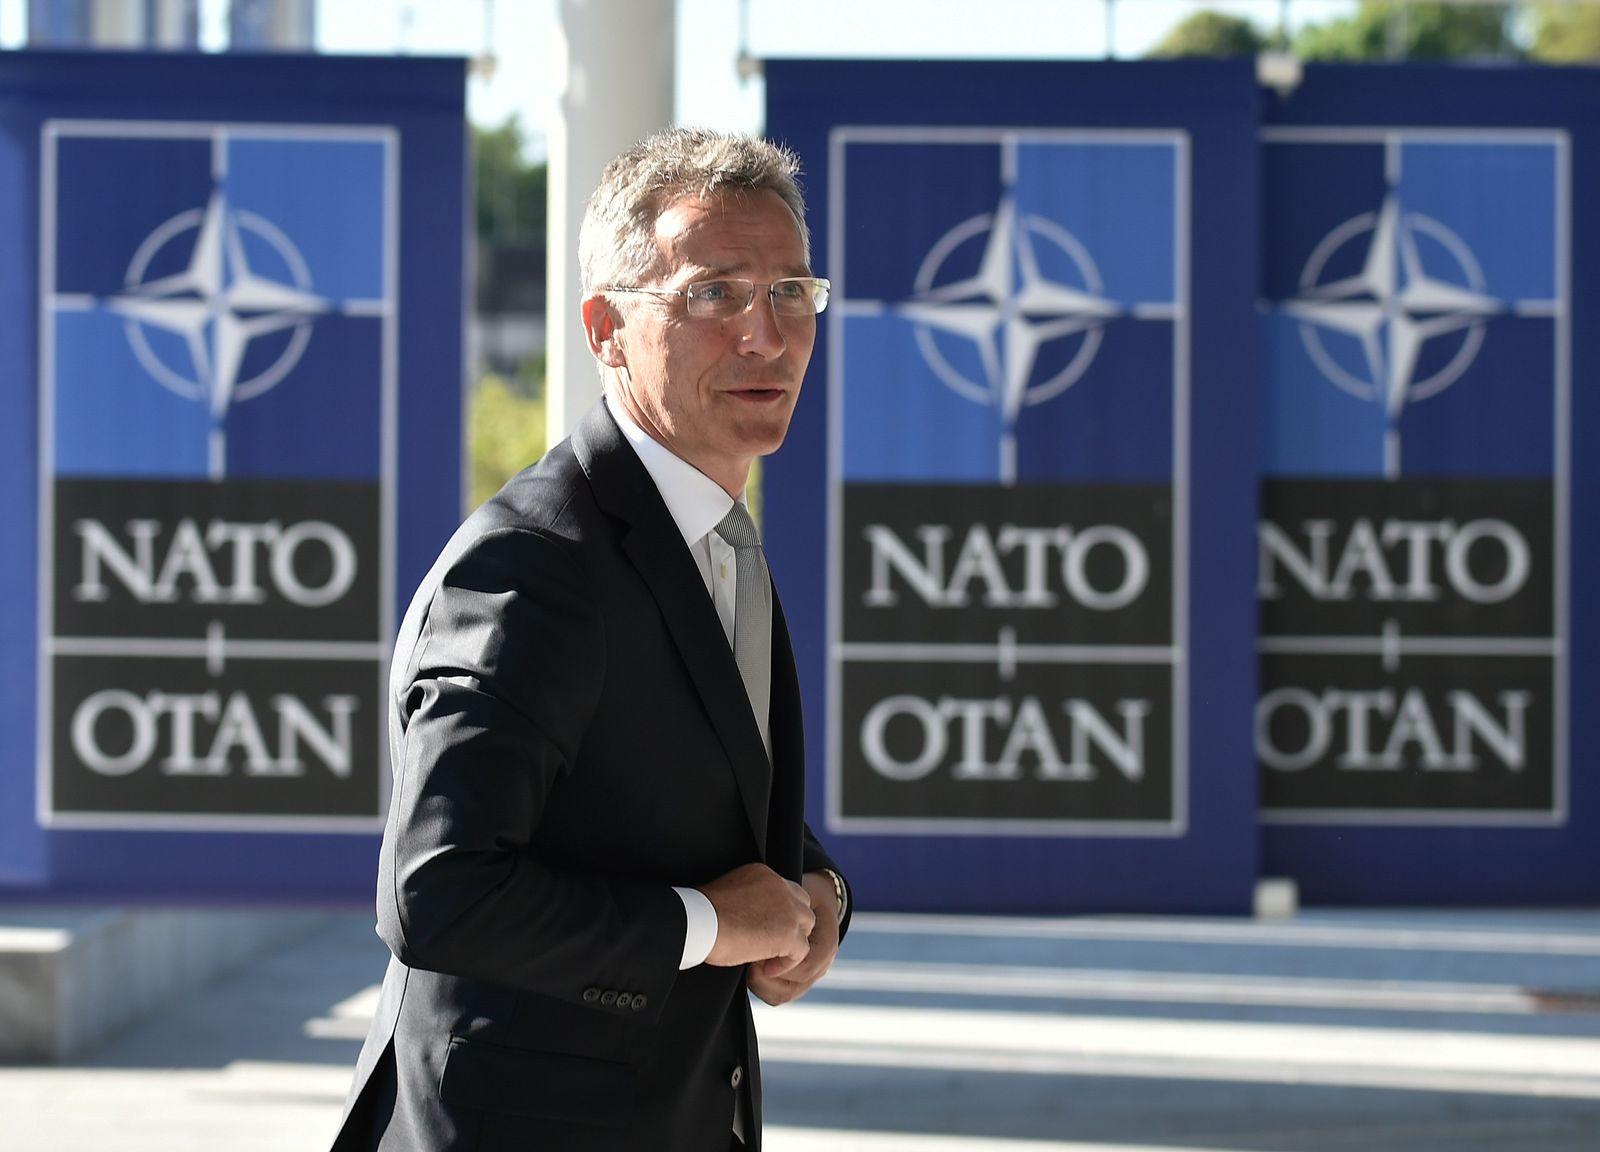 BELGIUM-NATO-STOLTENBERG